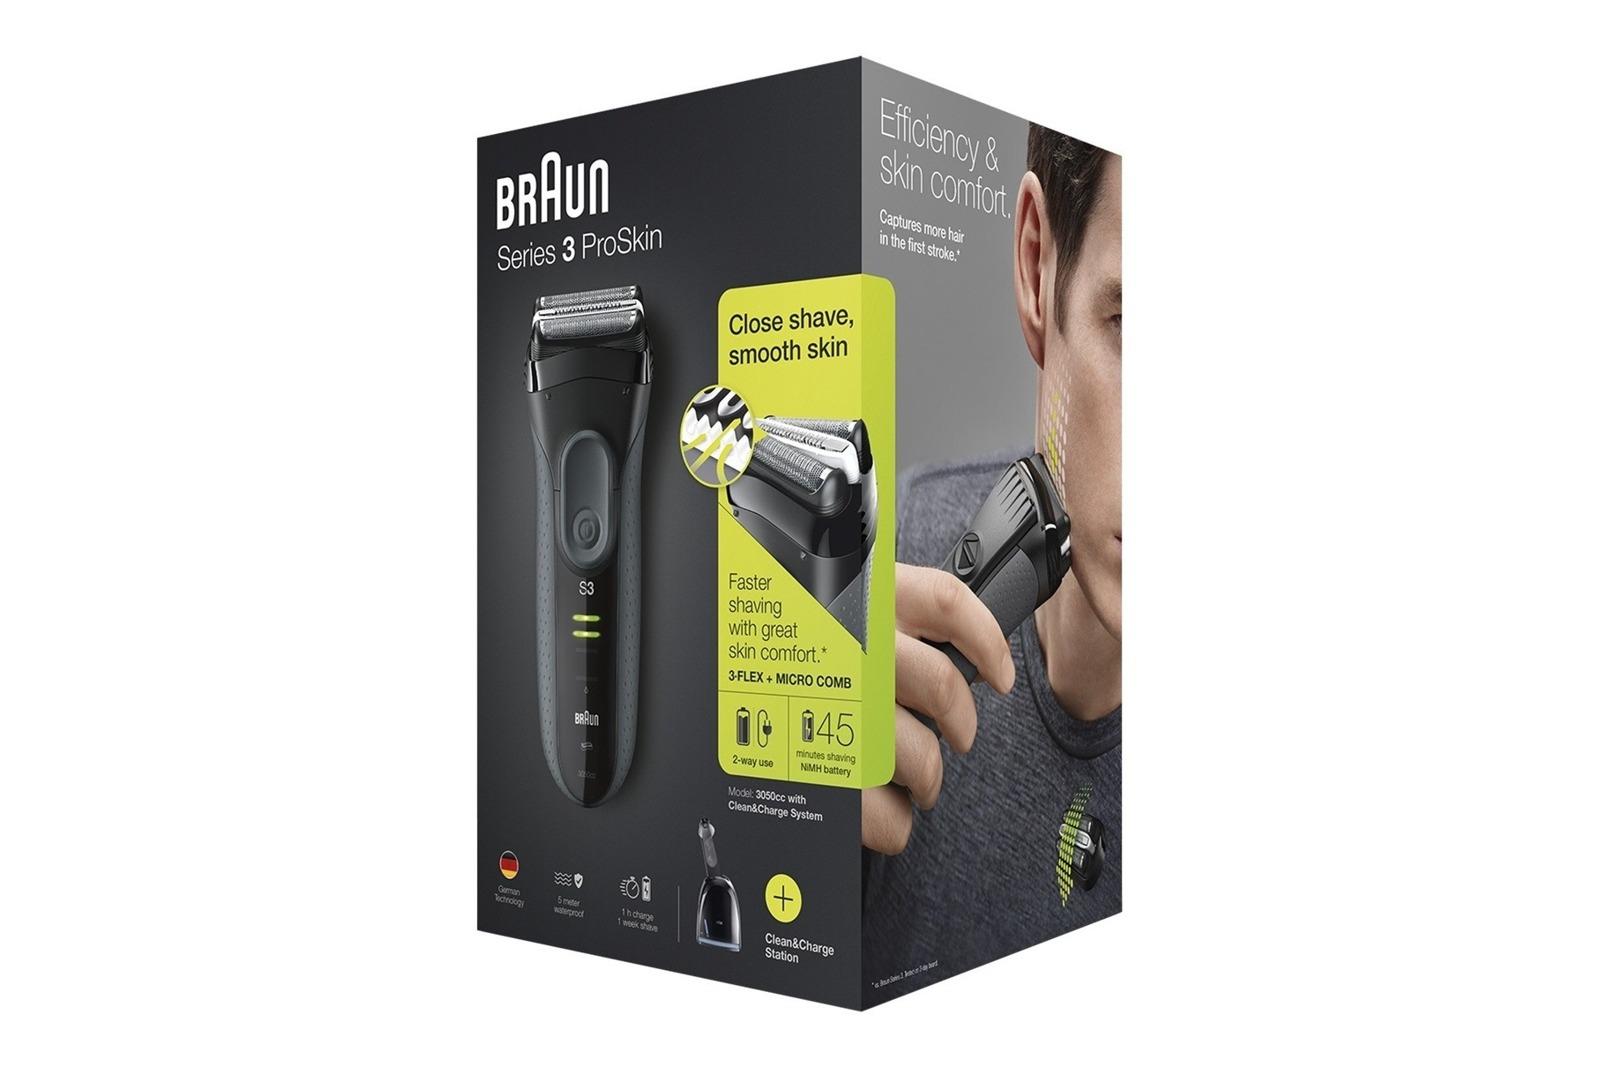 Braun Series 3 ProSkin 3050cc Rasierer Grau + Clean&Charger Station